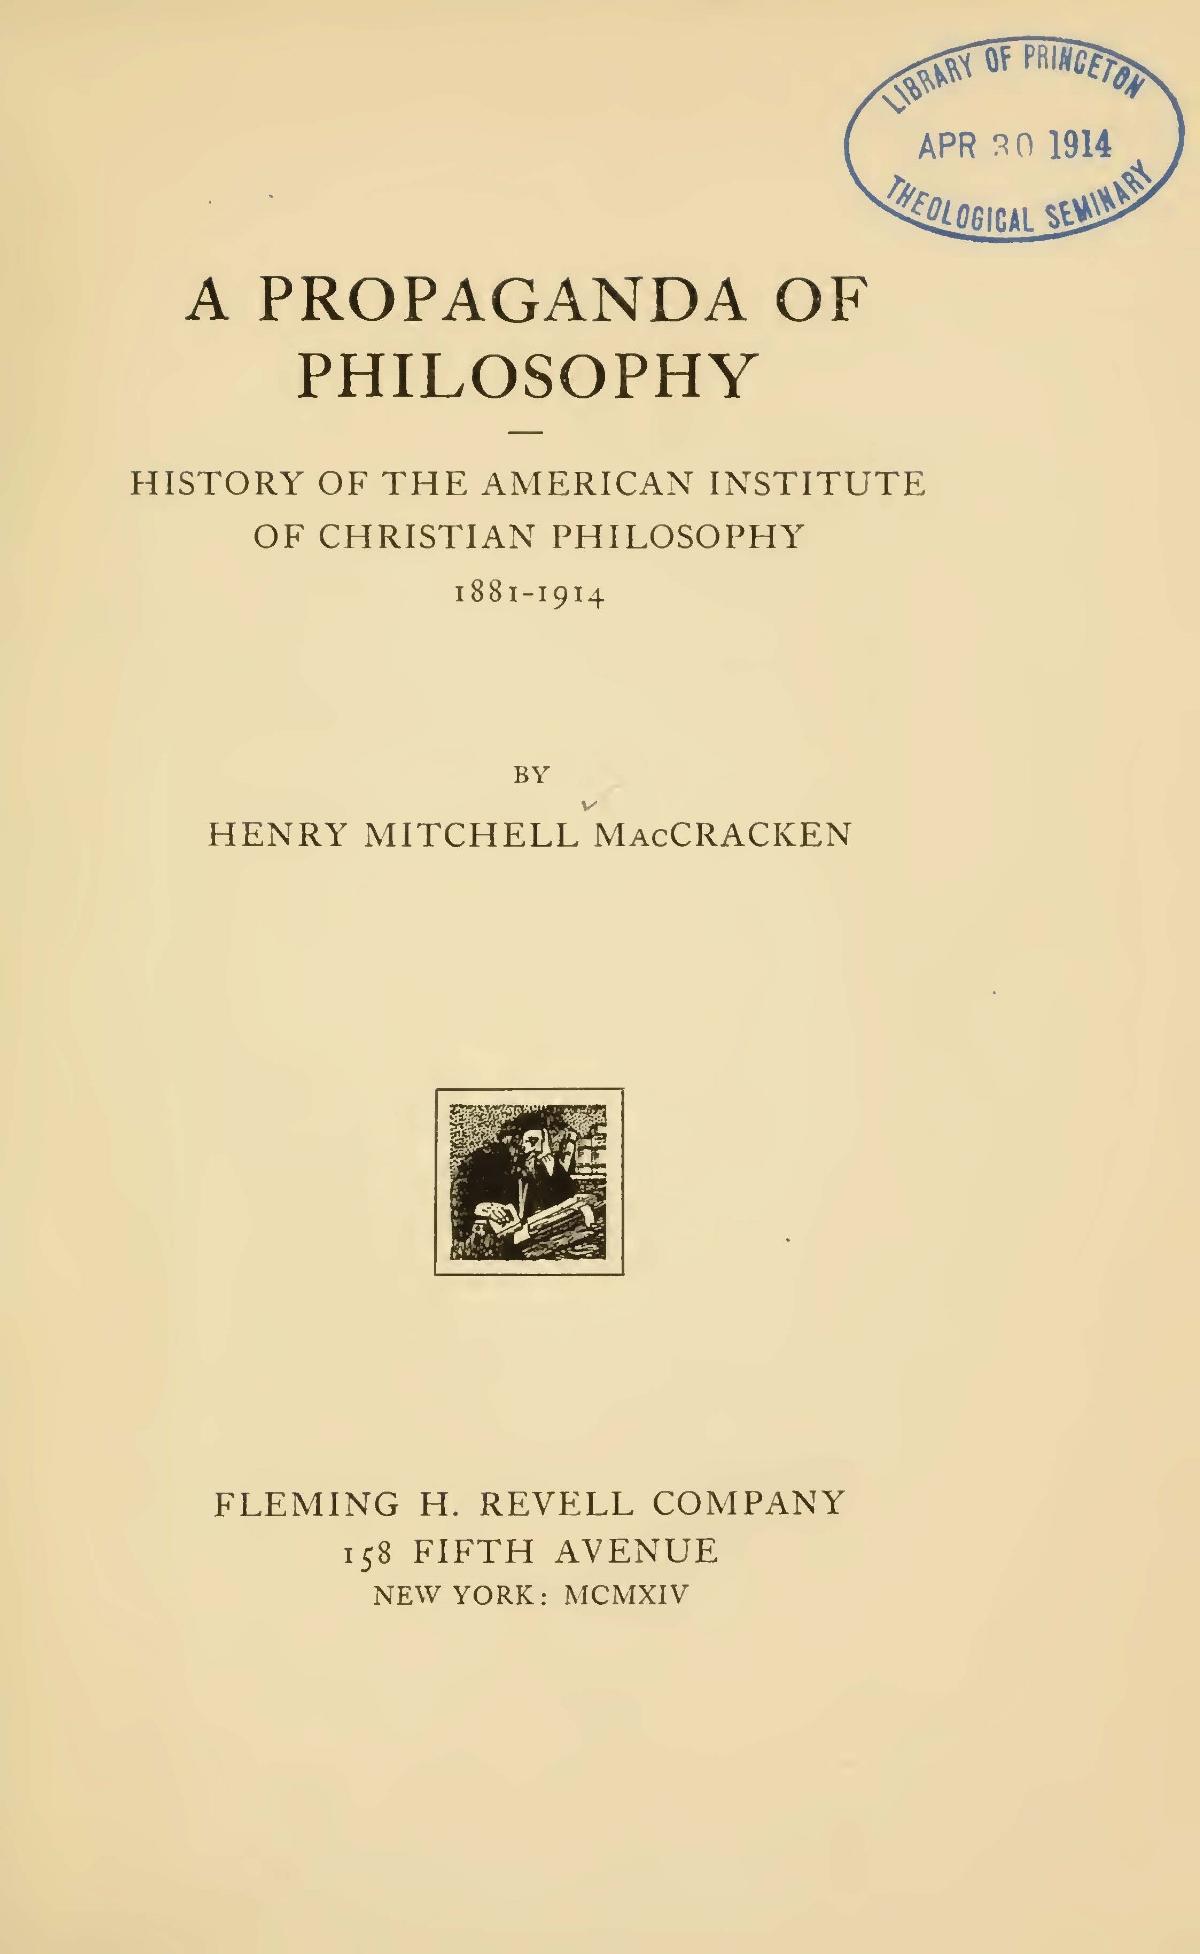 MacCracken, Henry Mitchell, A Propoganda of Philosophy Title Page.jpg